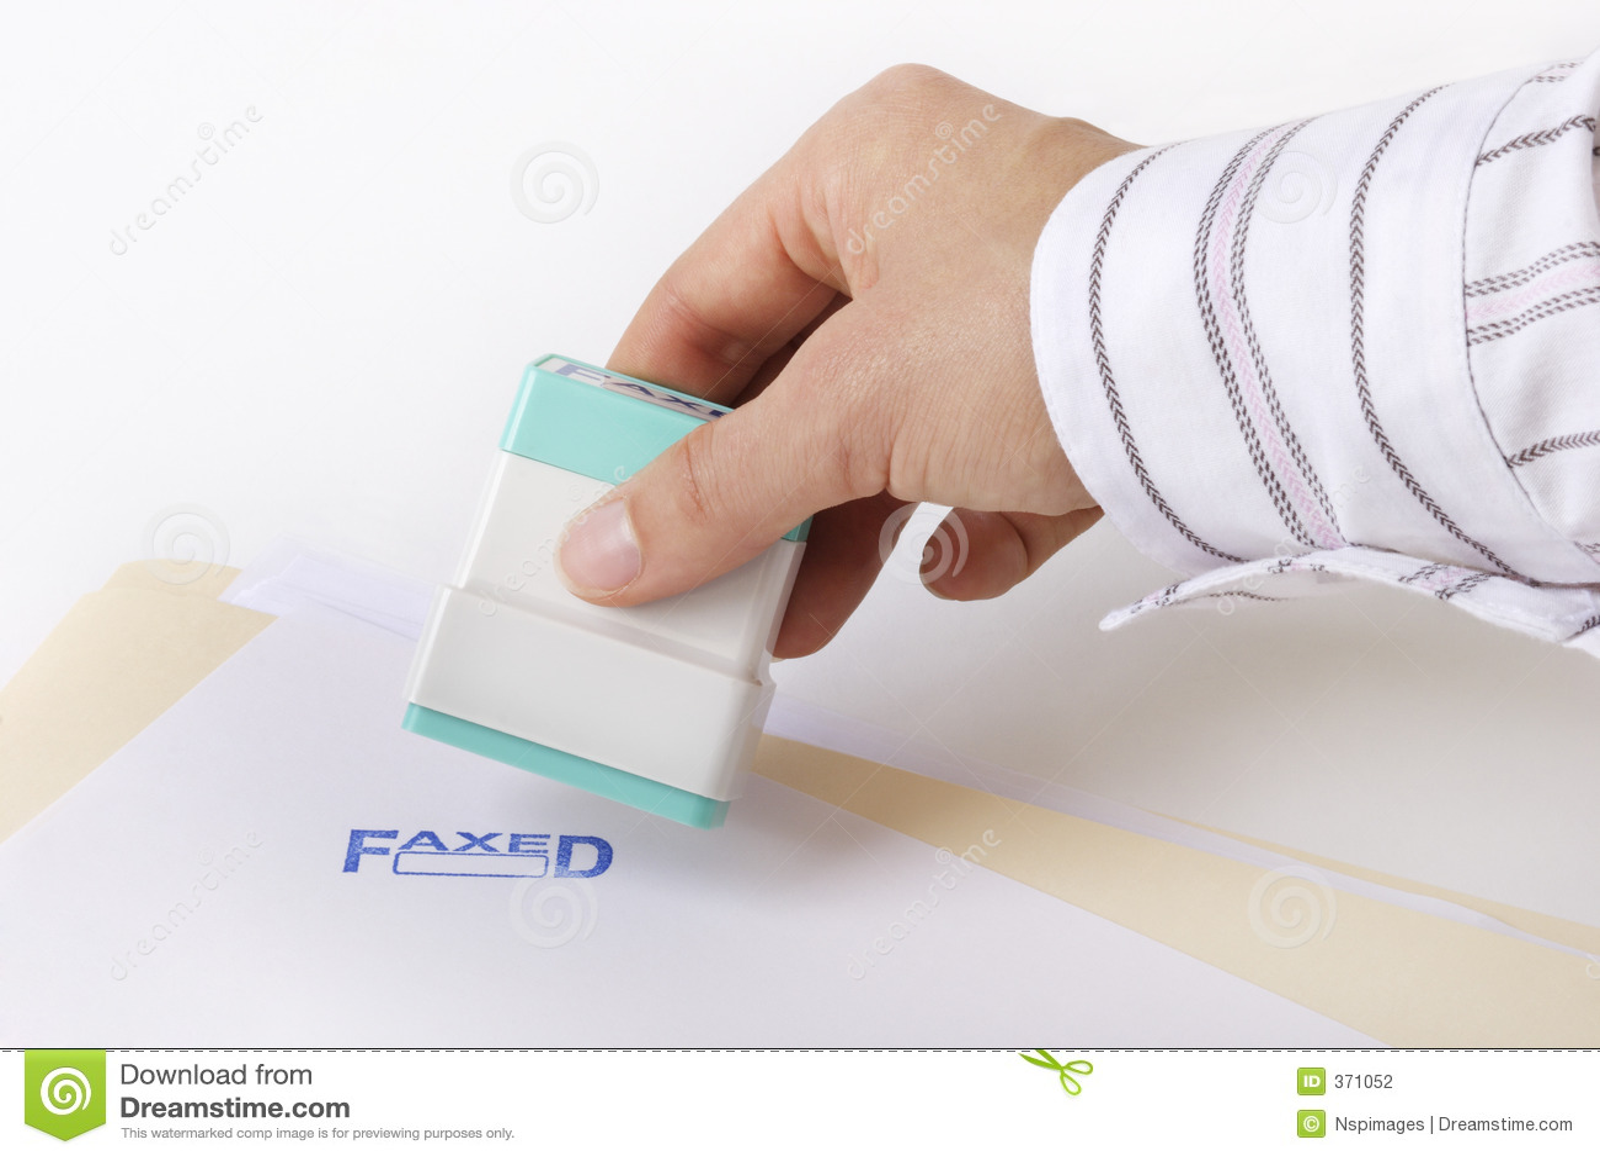 Estampille faxée